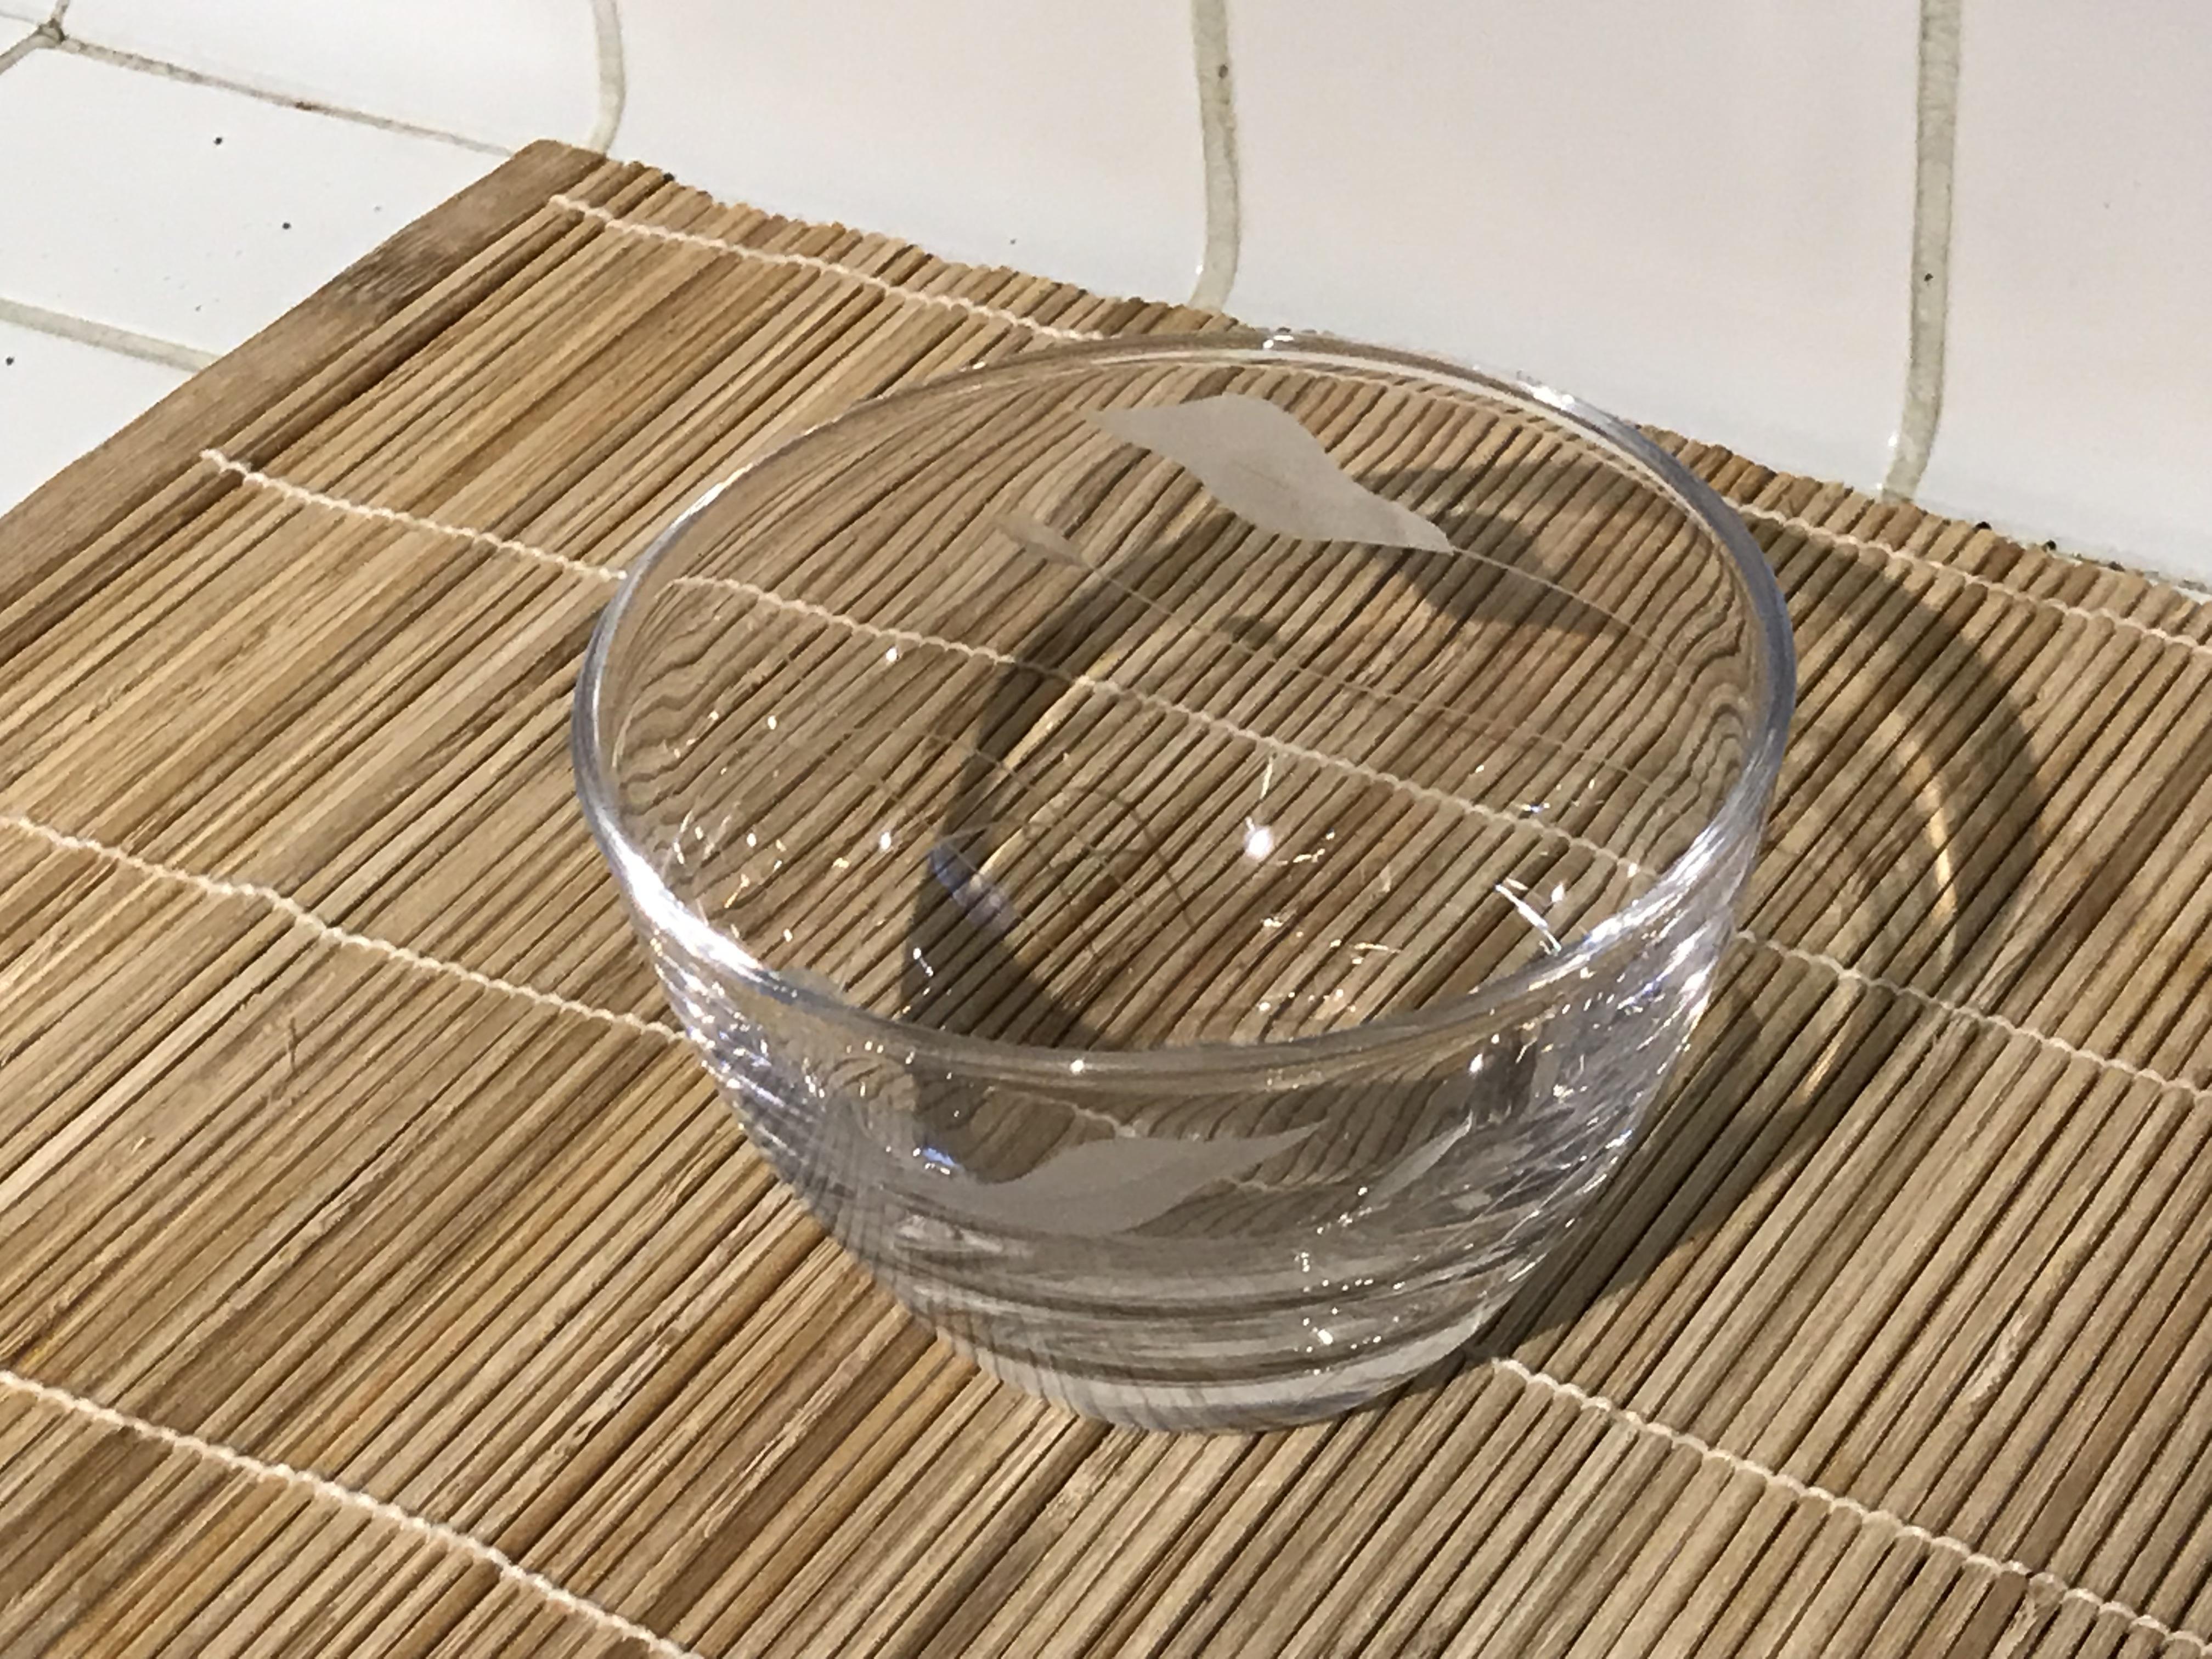 Pfaltzgraff Linea Pattern (Made In China) Clear Glass Bowl: Lead Free, Cadmium Free, Arsenic Free, Mercury Free!